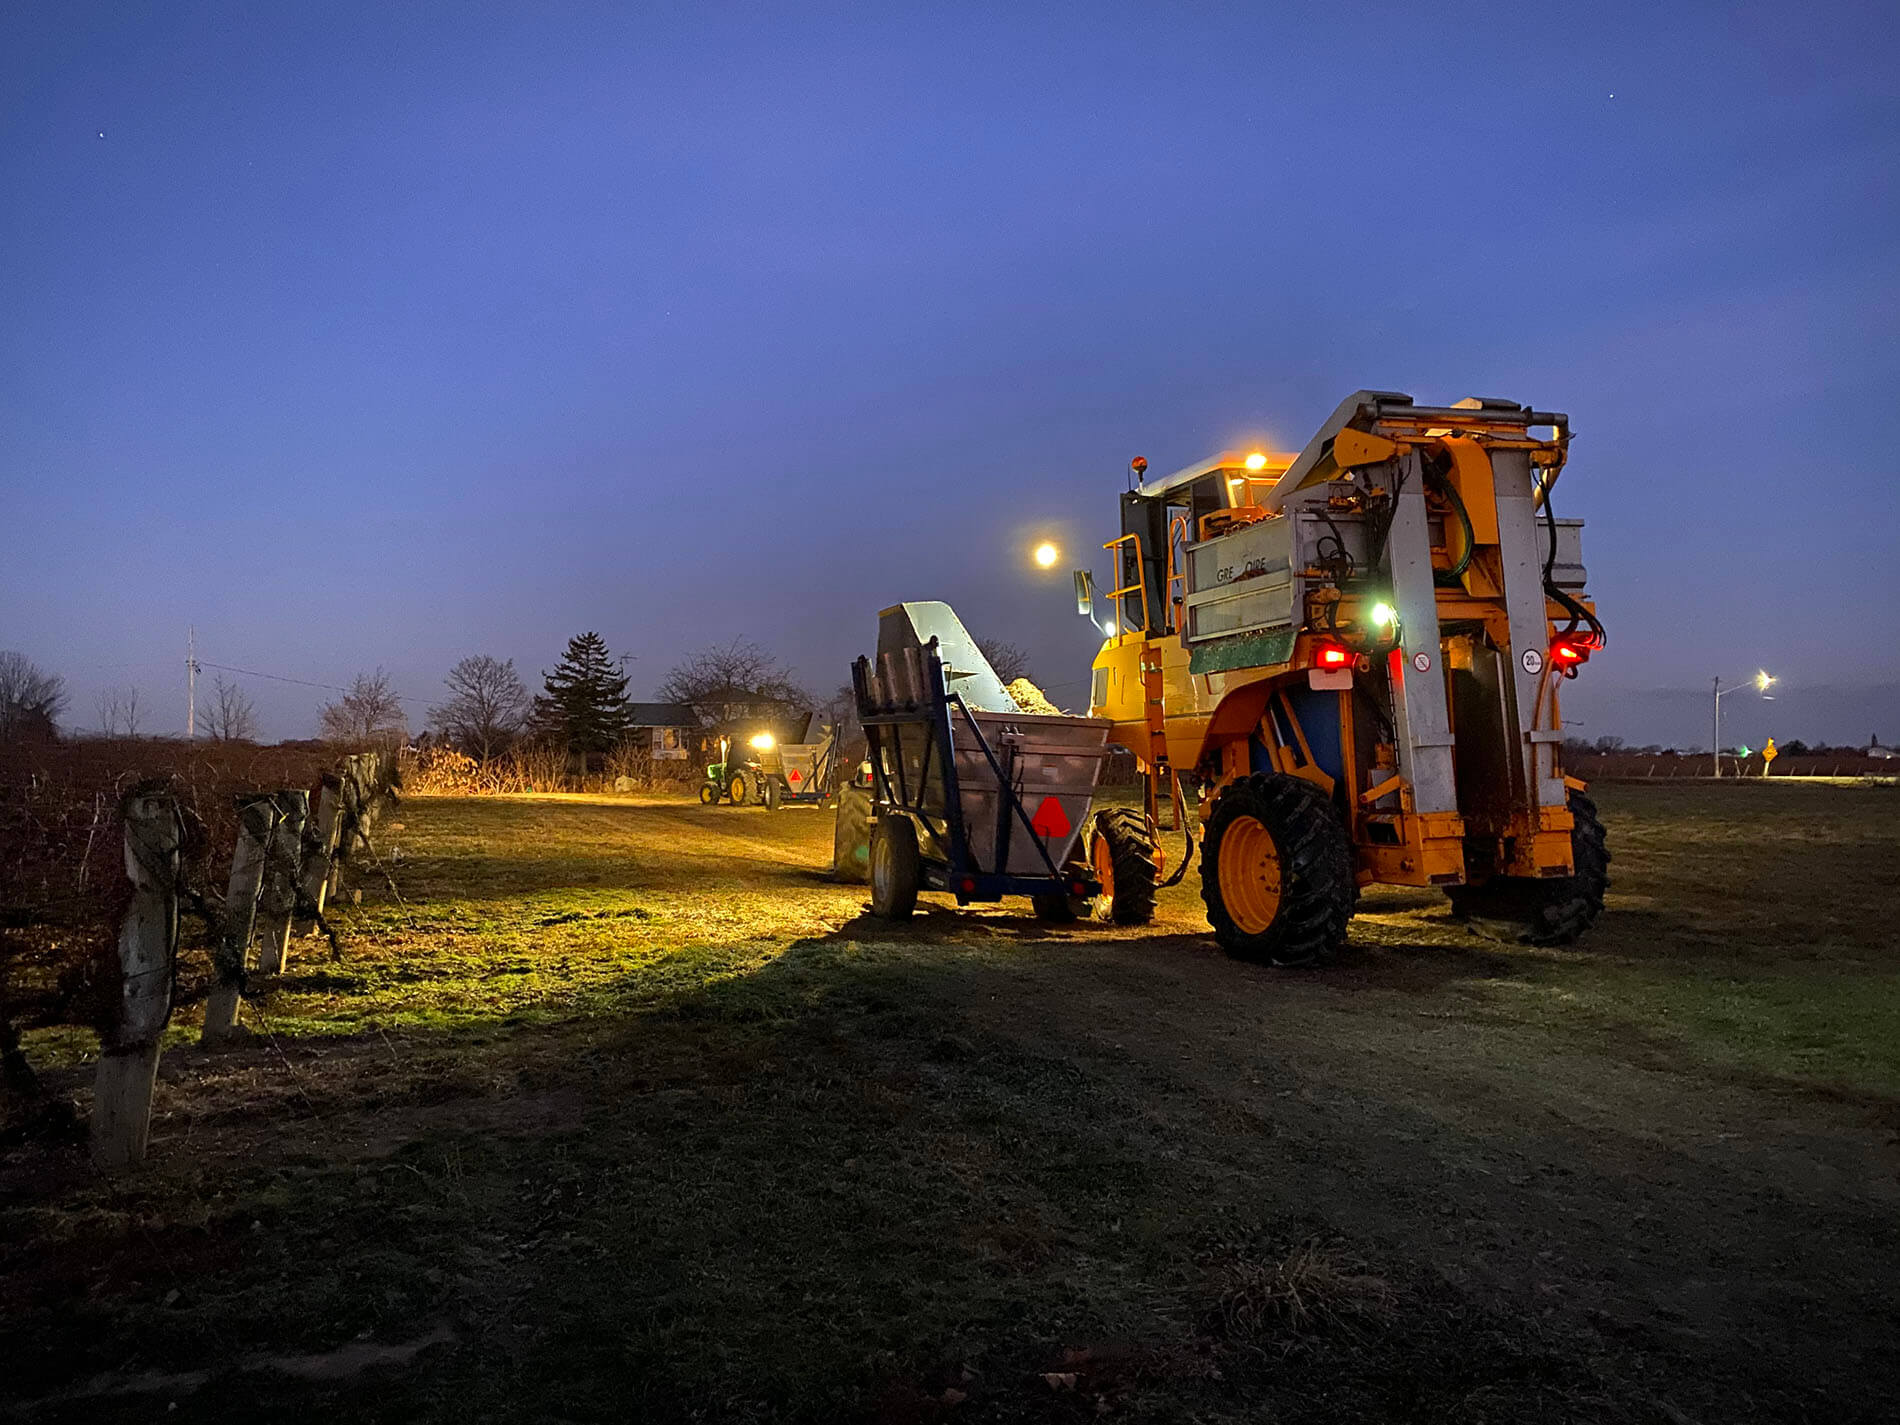 Icewine - harvest at night